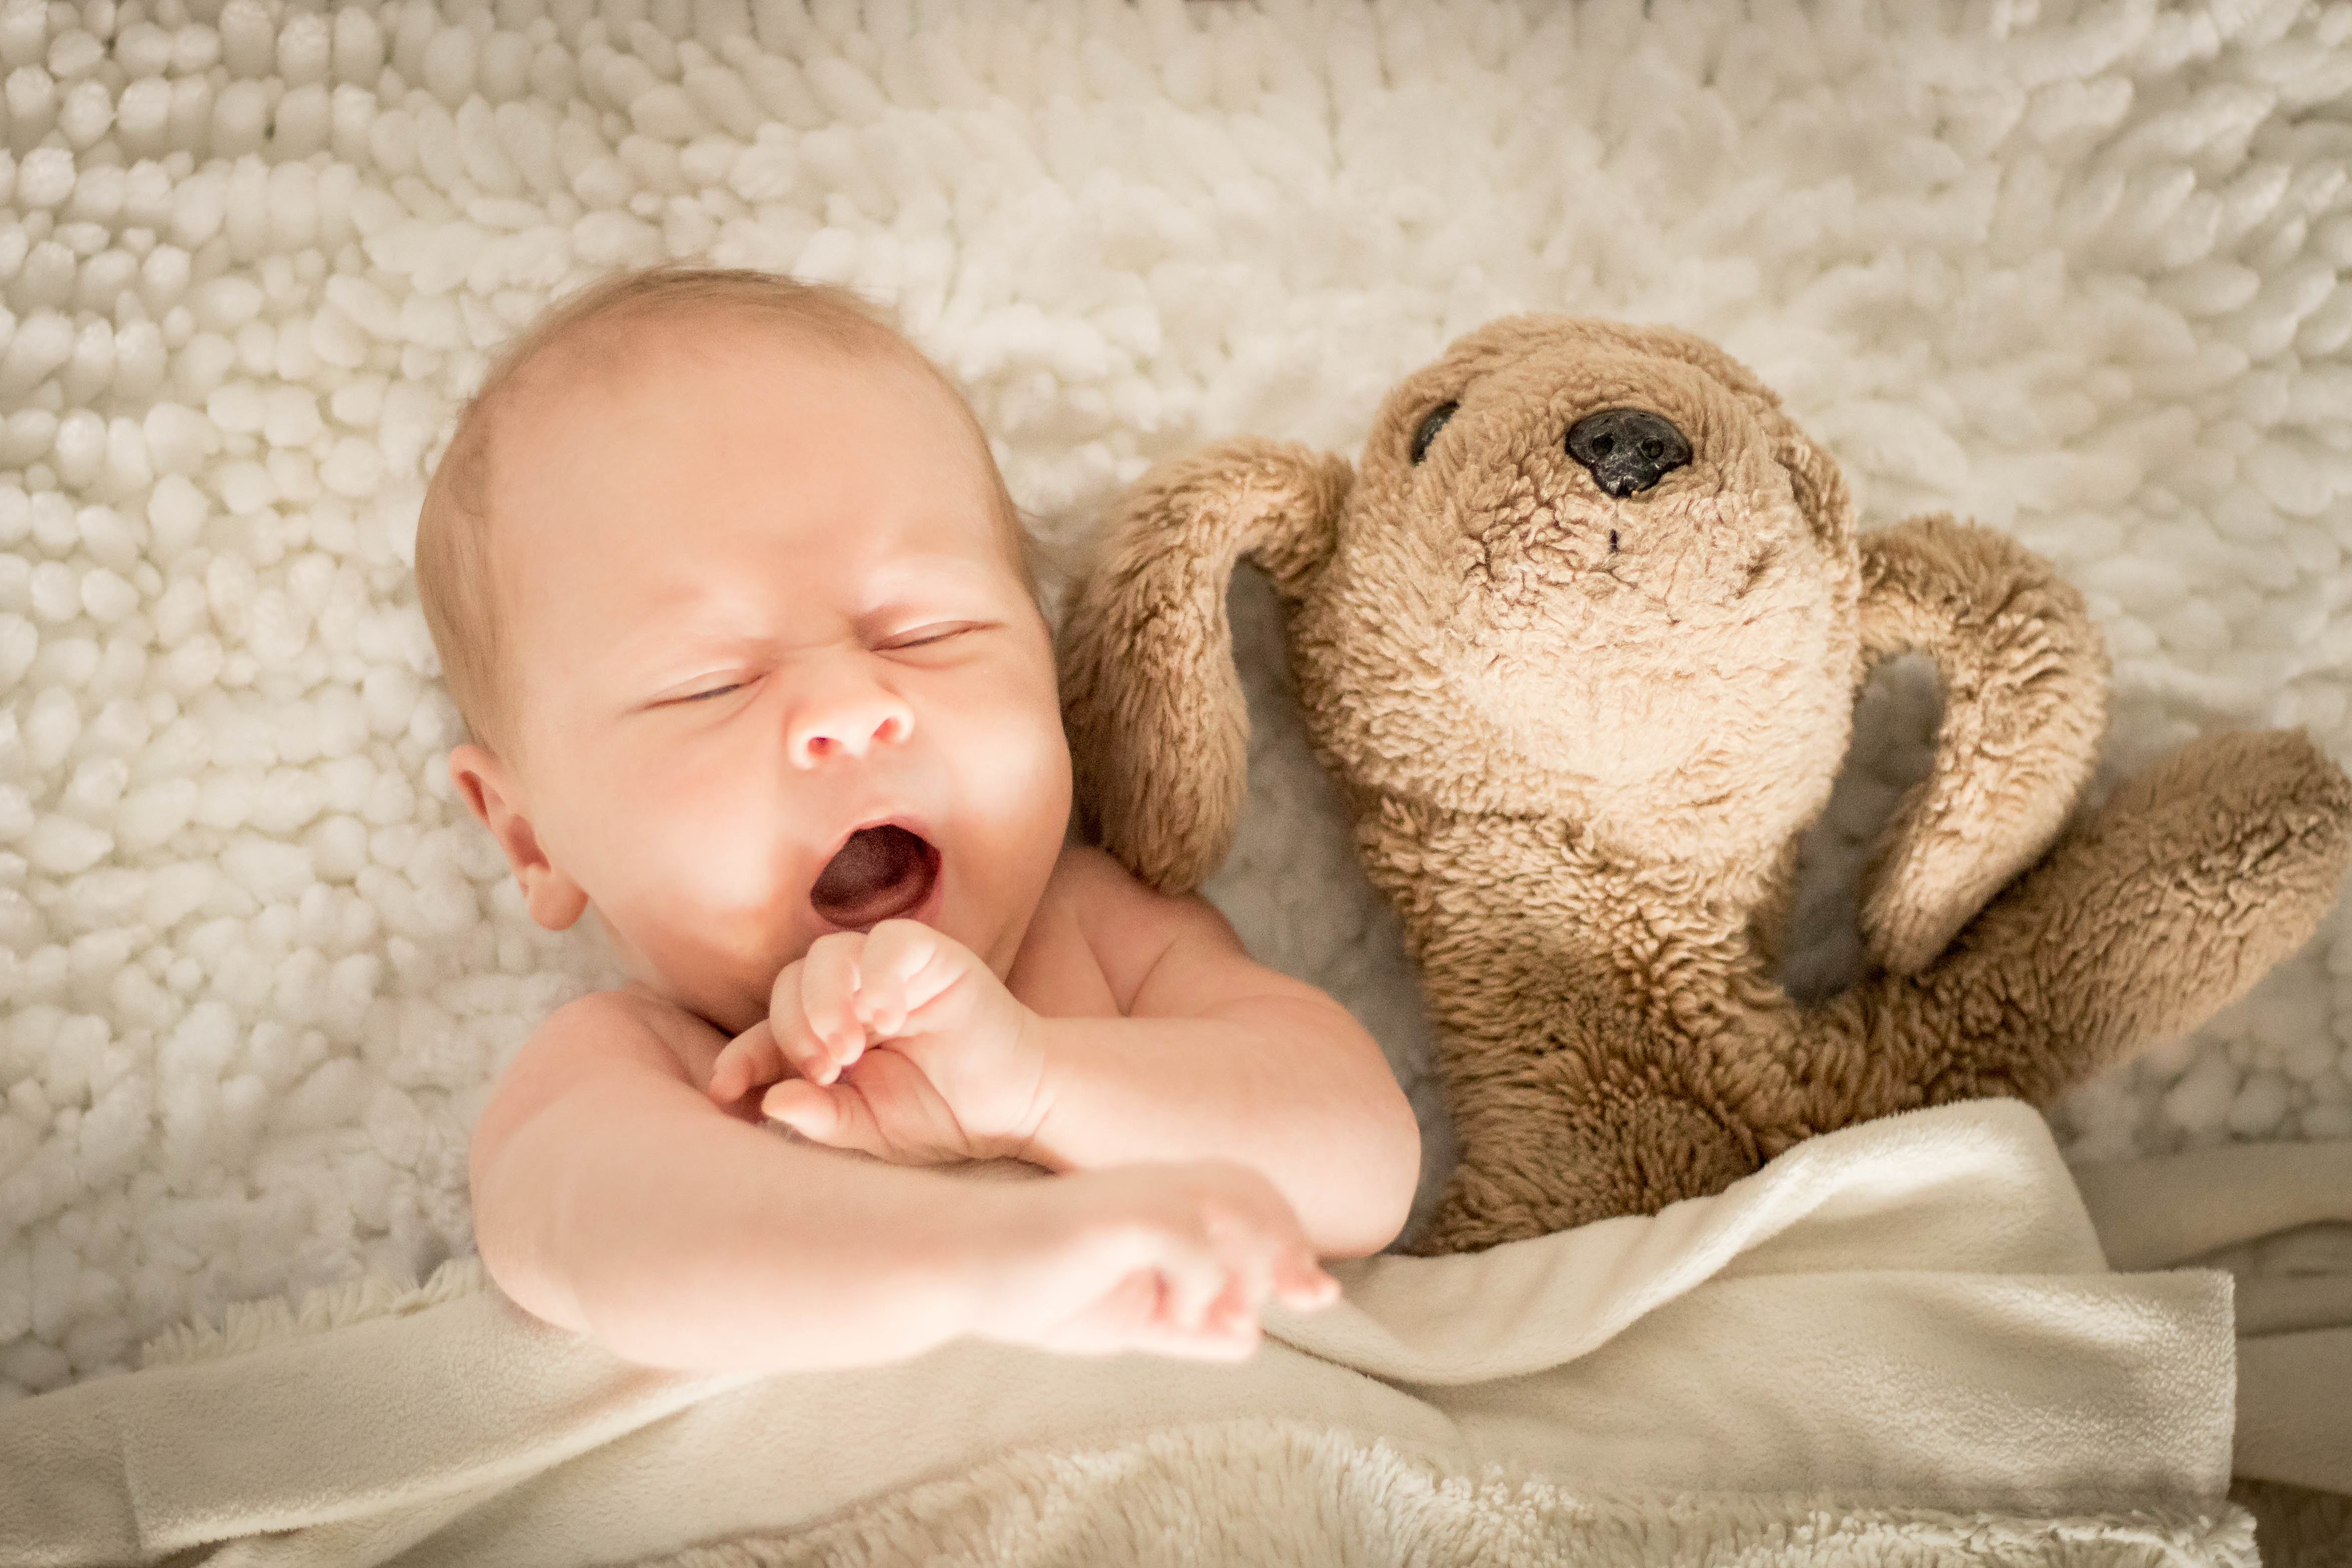 Newborn Shoot by JeJe Design